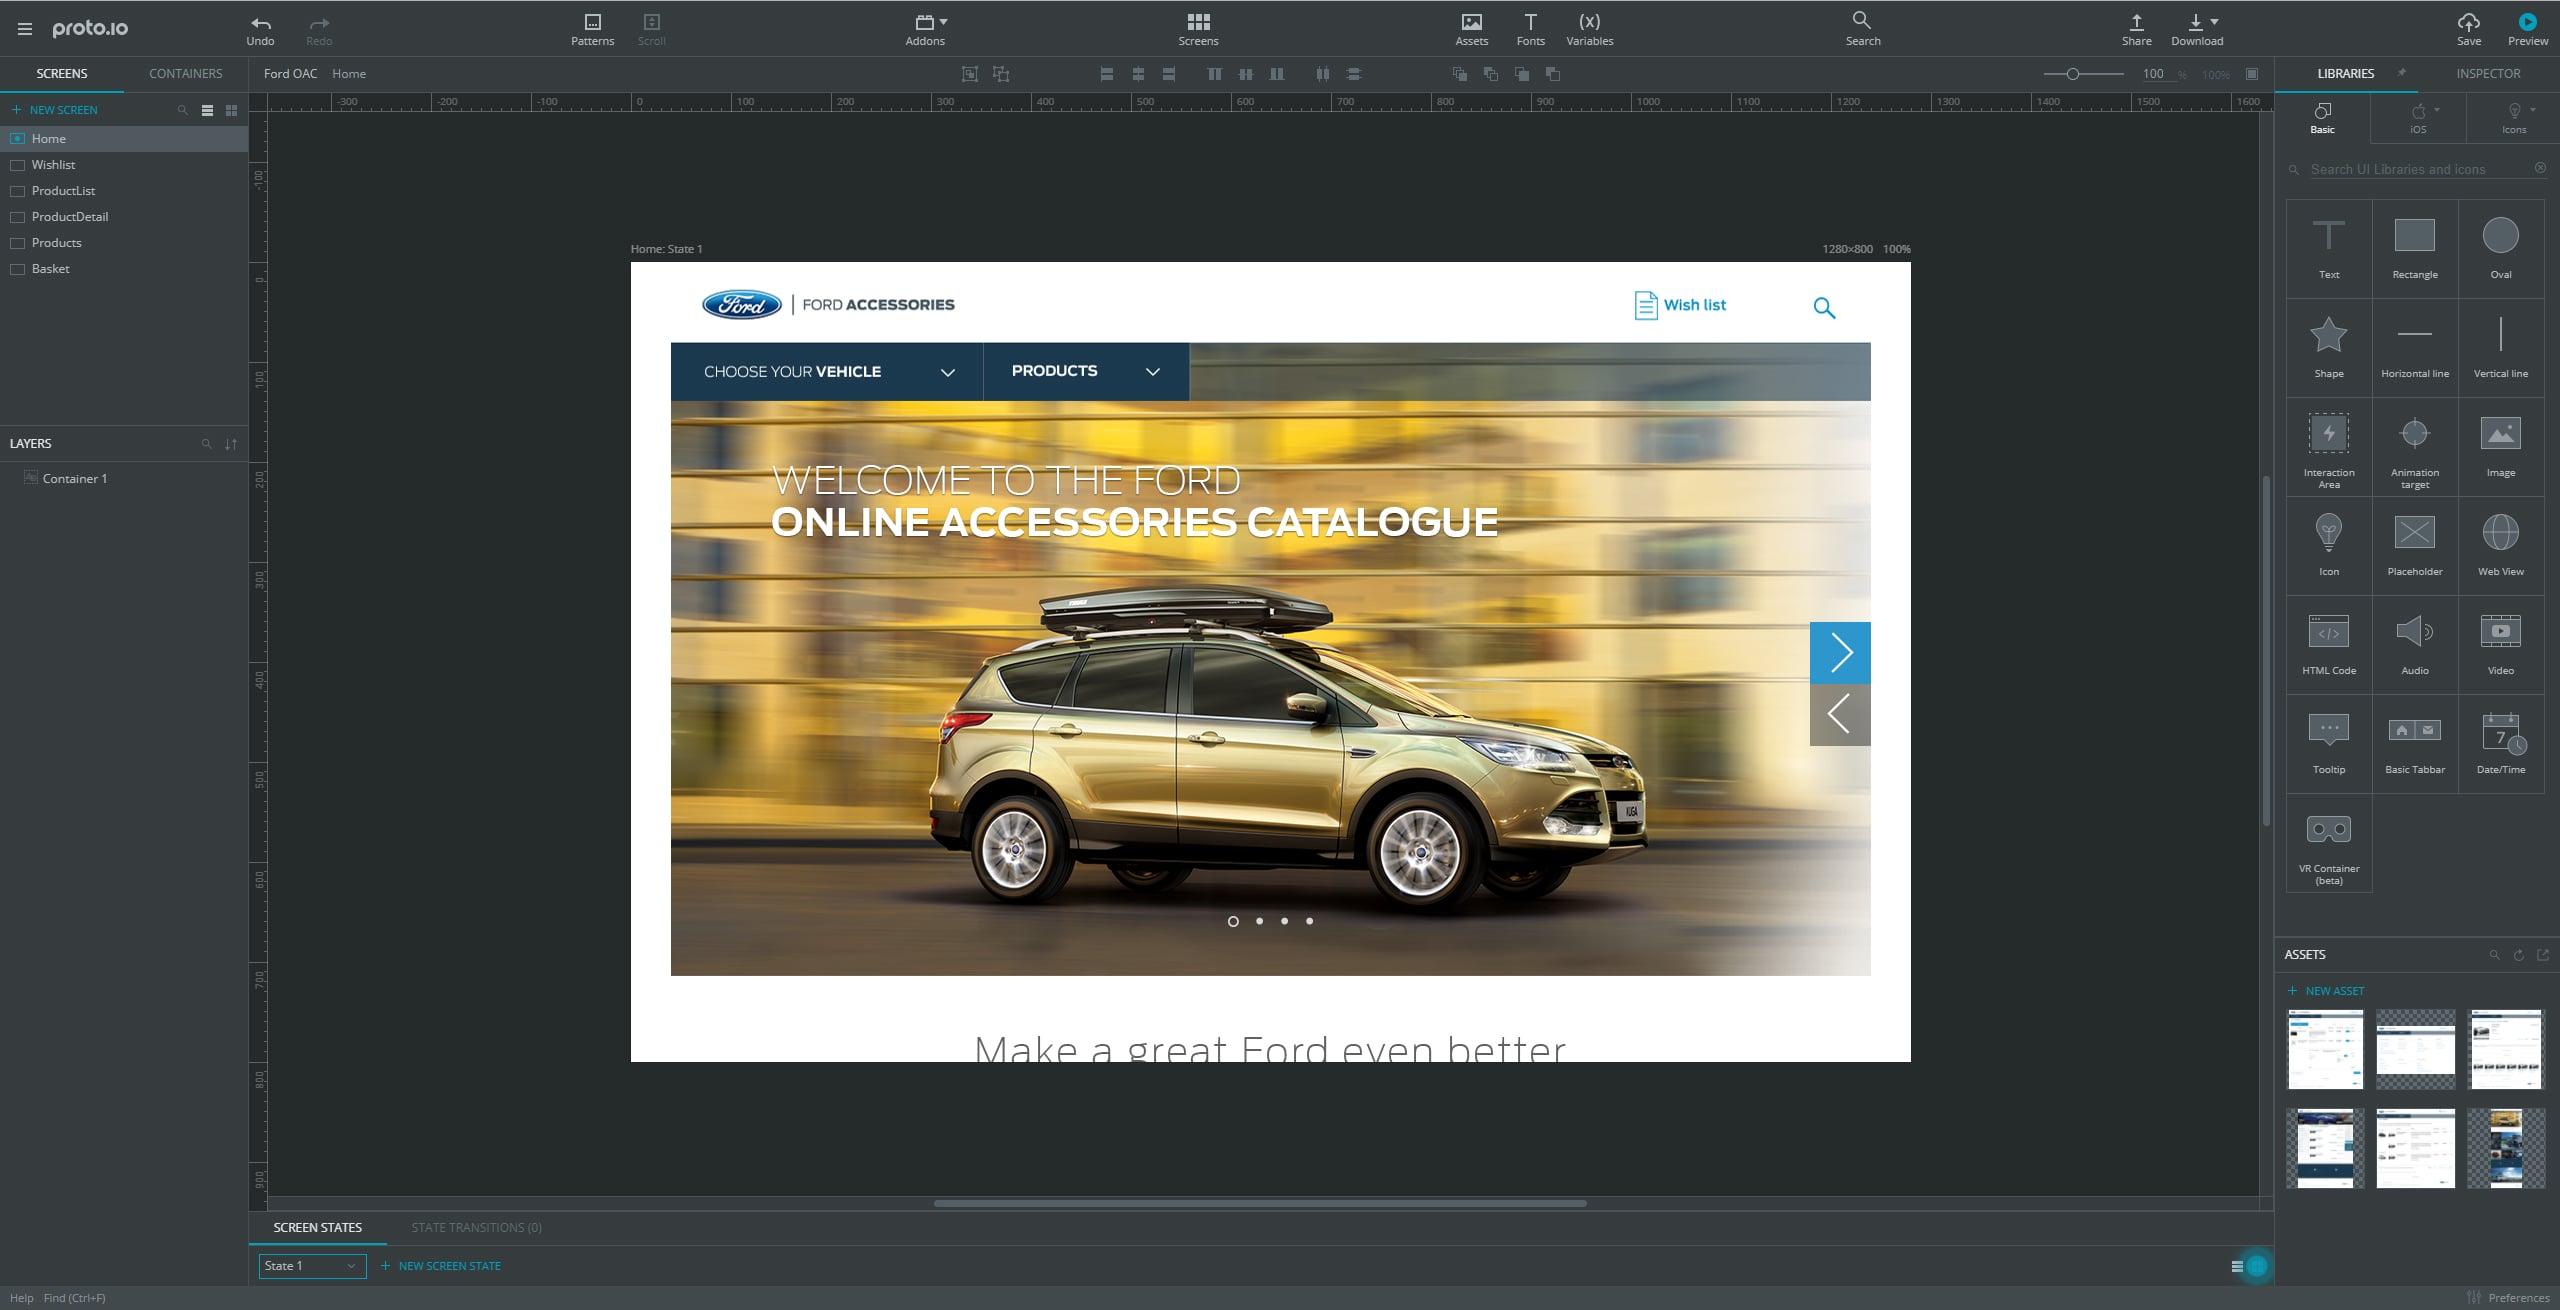 Ford online accessory catalogue proto io prototype